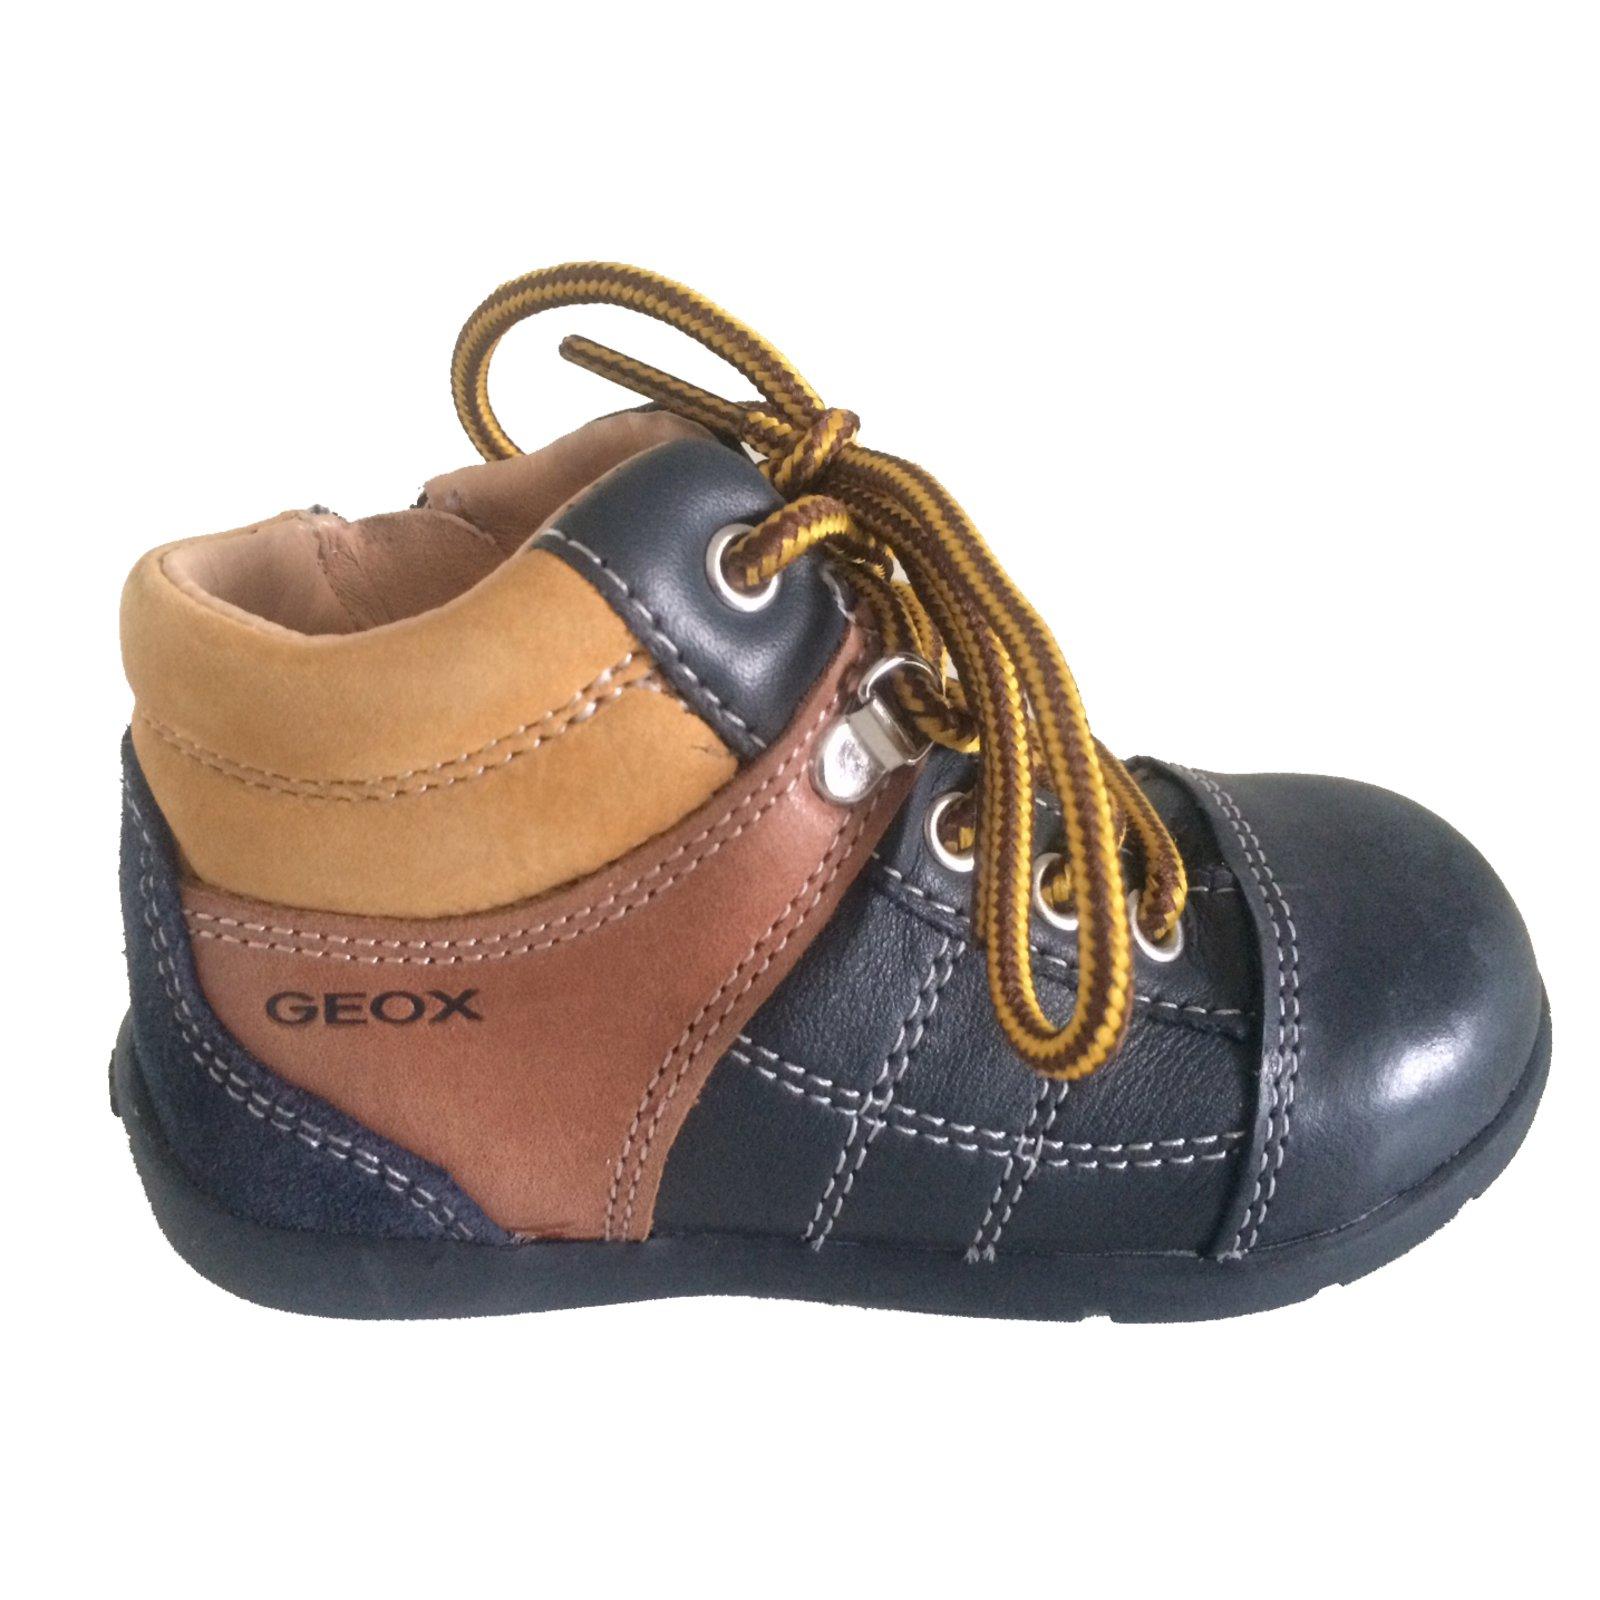 bottes bottines geox bottes suede cuir marron bleu jaune joli closet. Black Bedroom Furniture Sets. Home Design Ideas